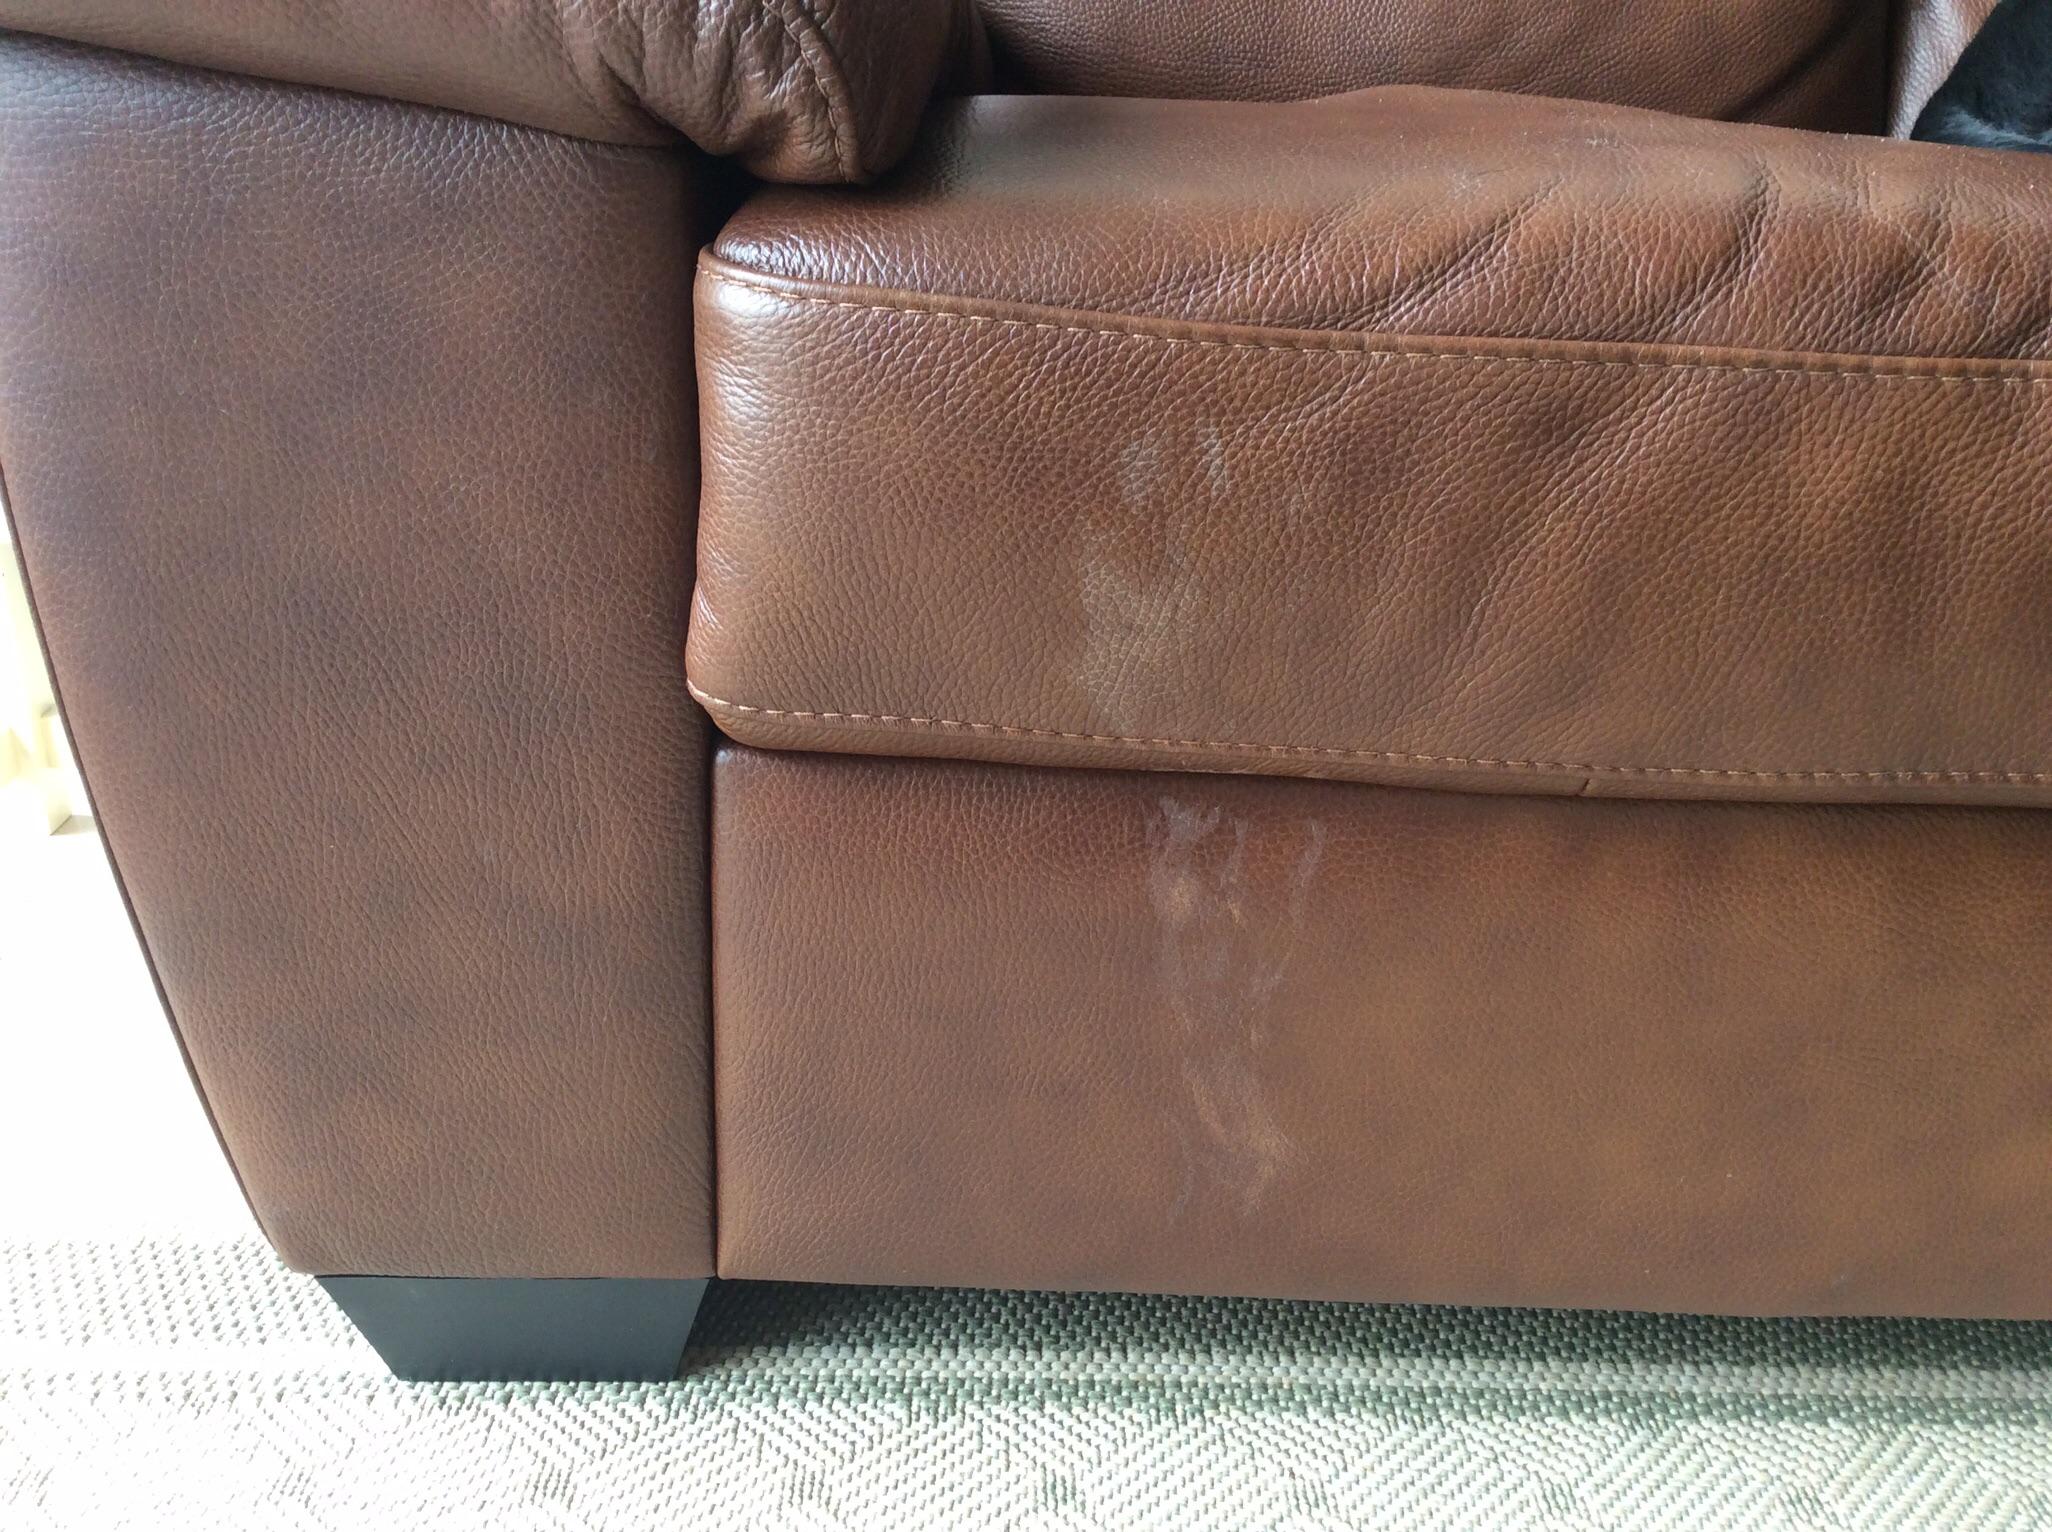 Flea treatment damage